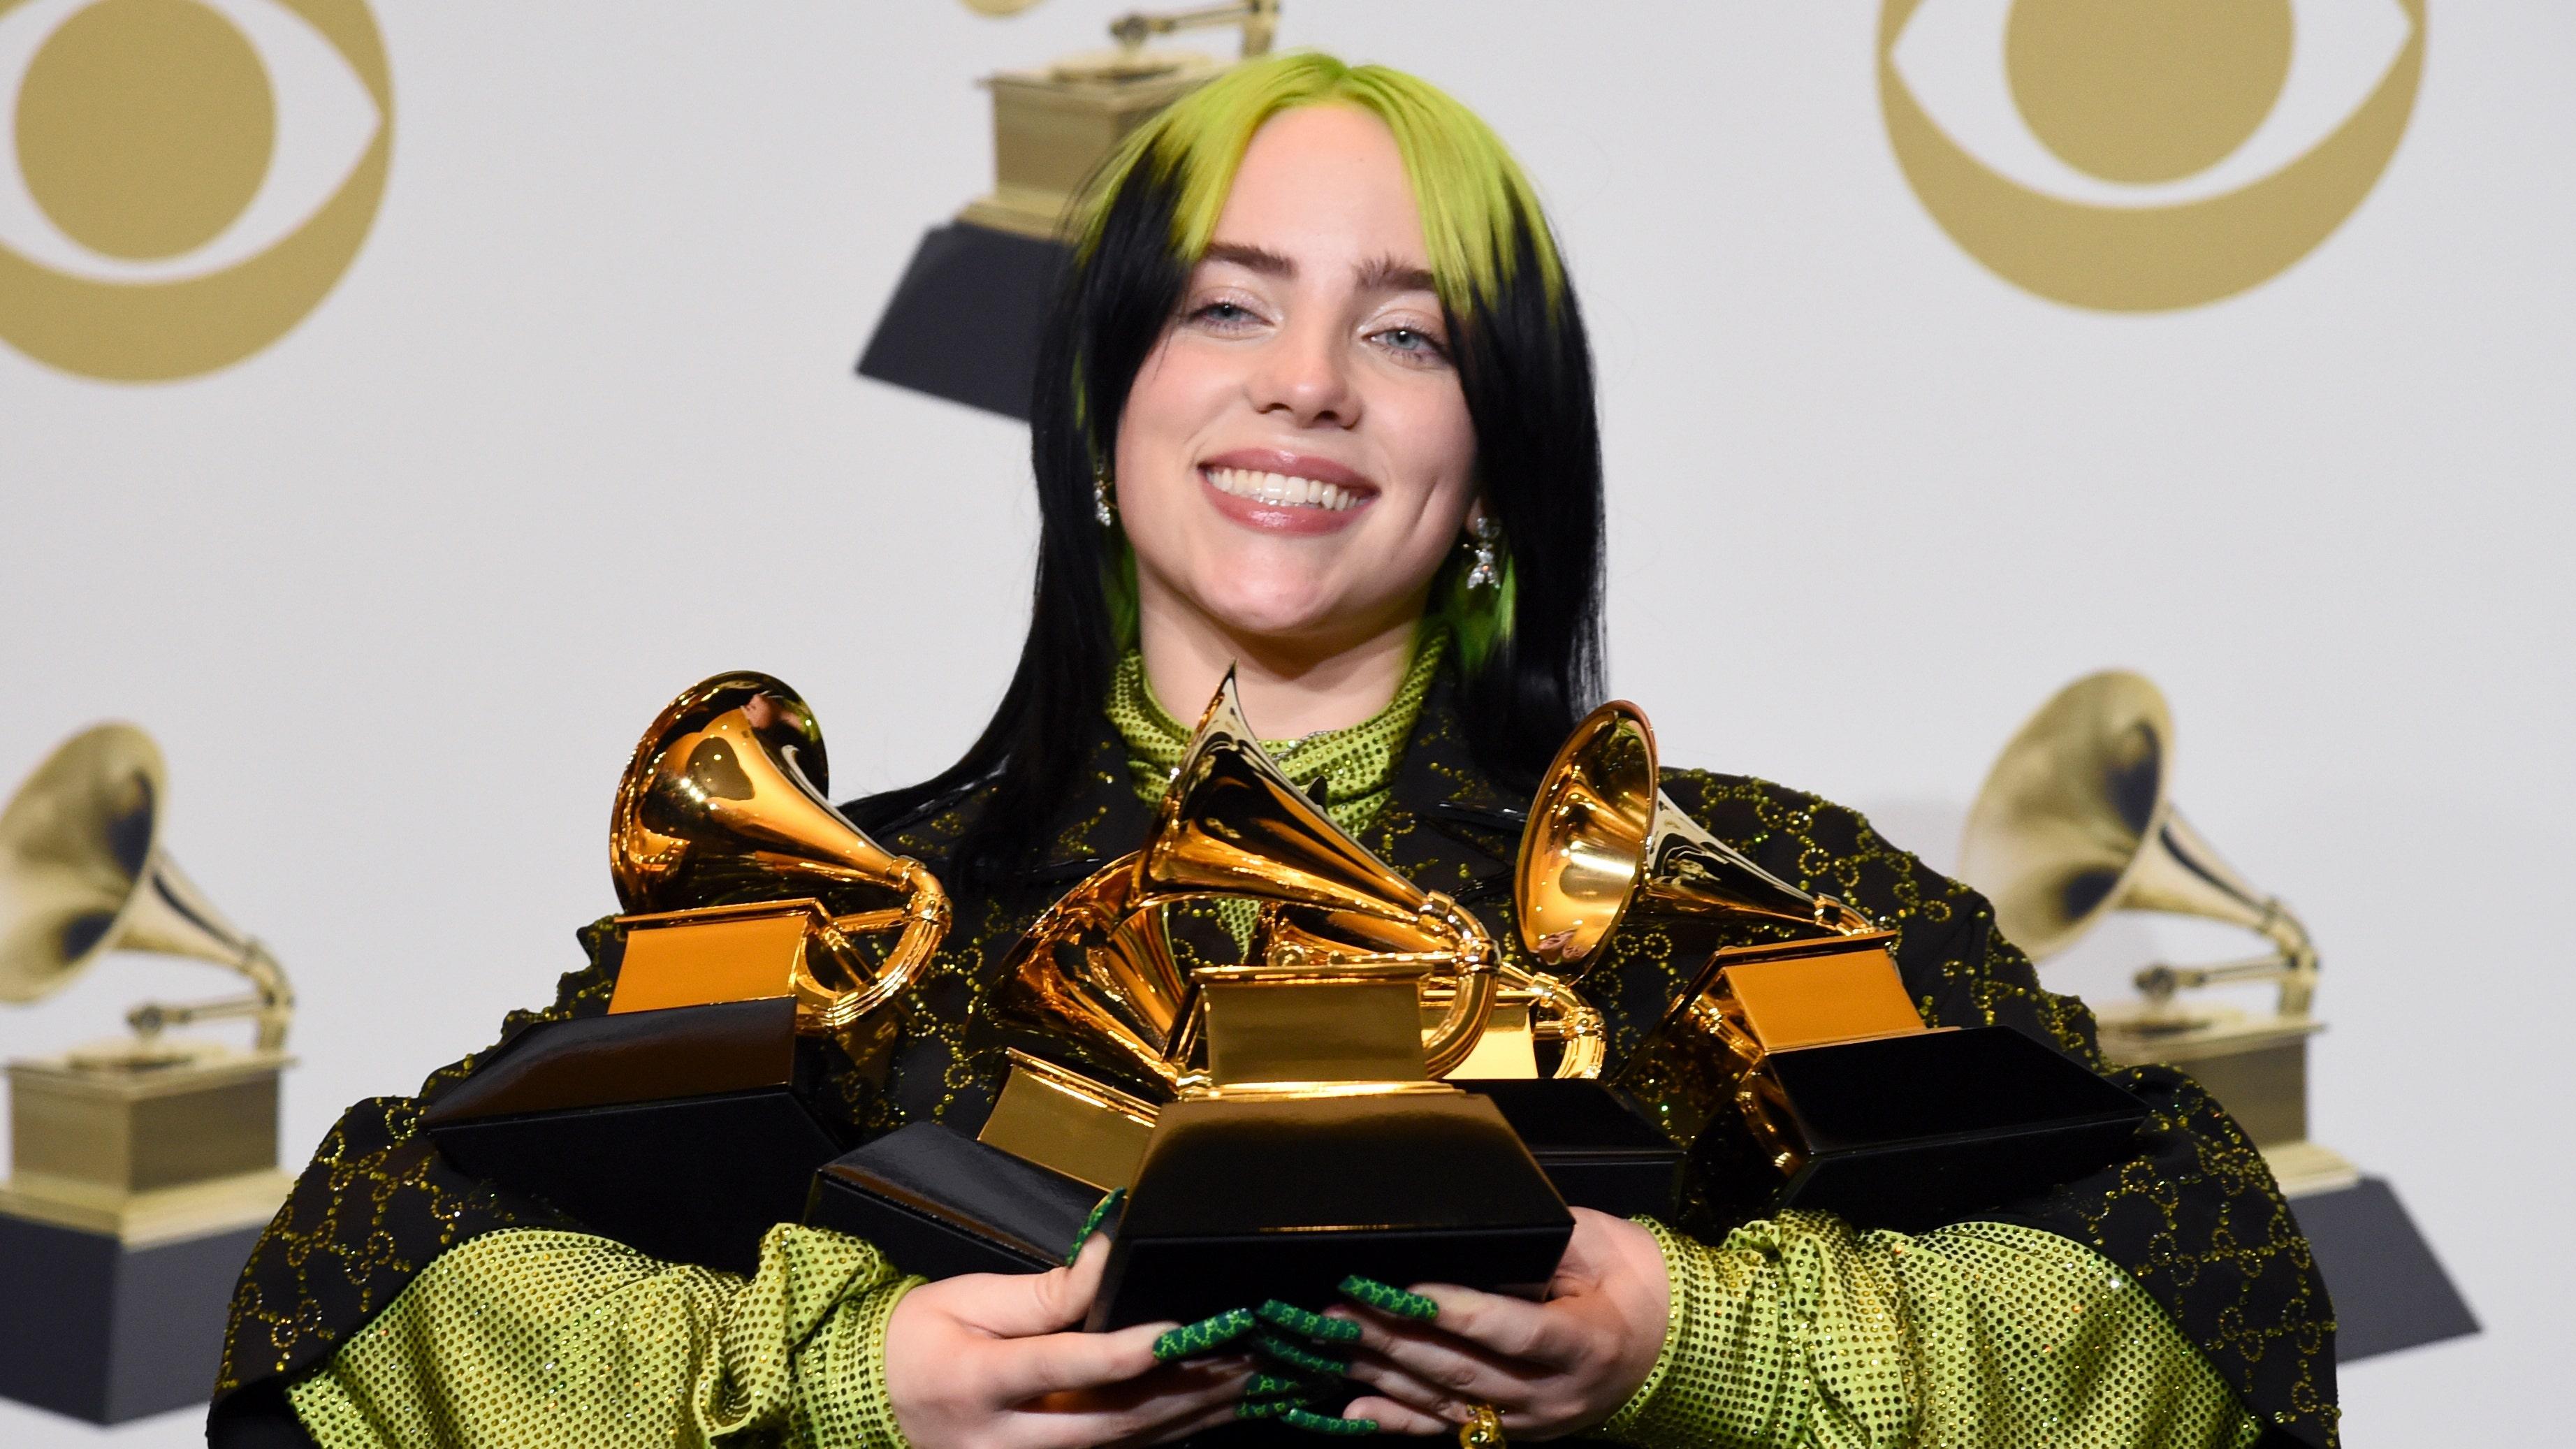 Grammy Awards: Billie Eilish makes history